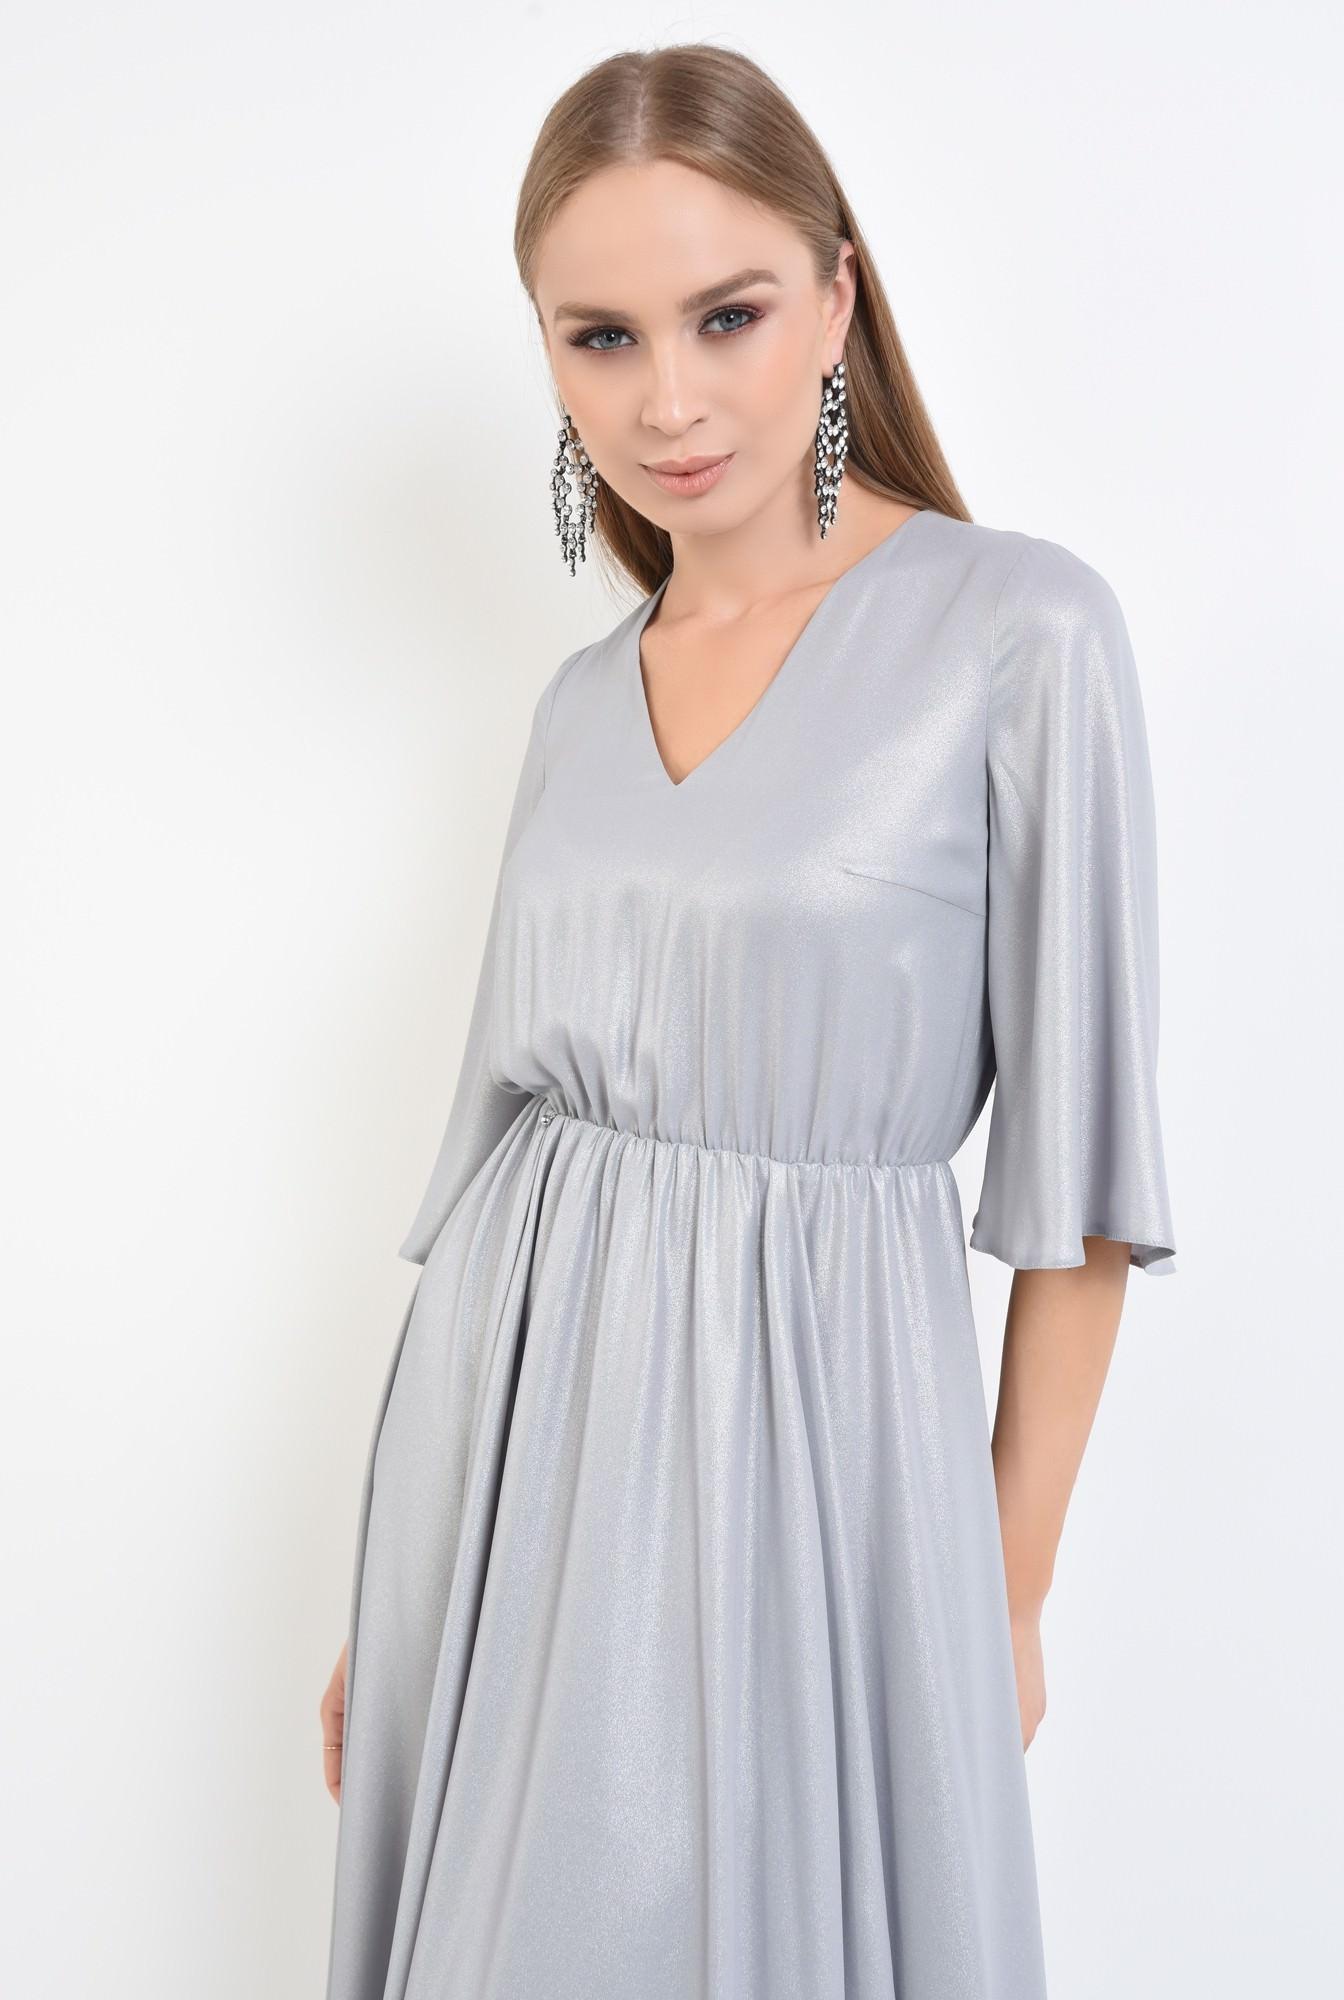 2 - rochie eleganta, clos, lurex, argintiu